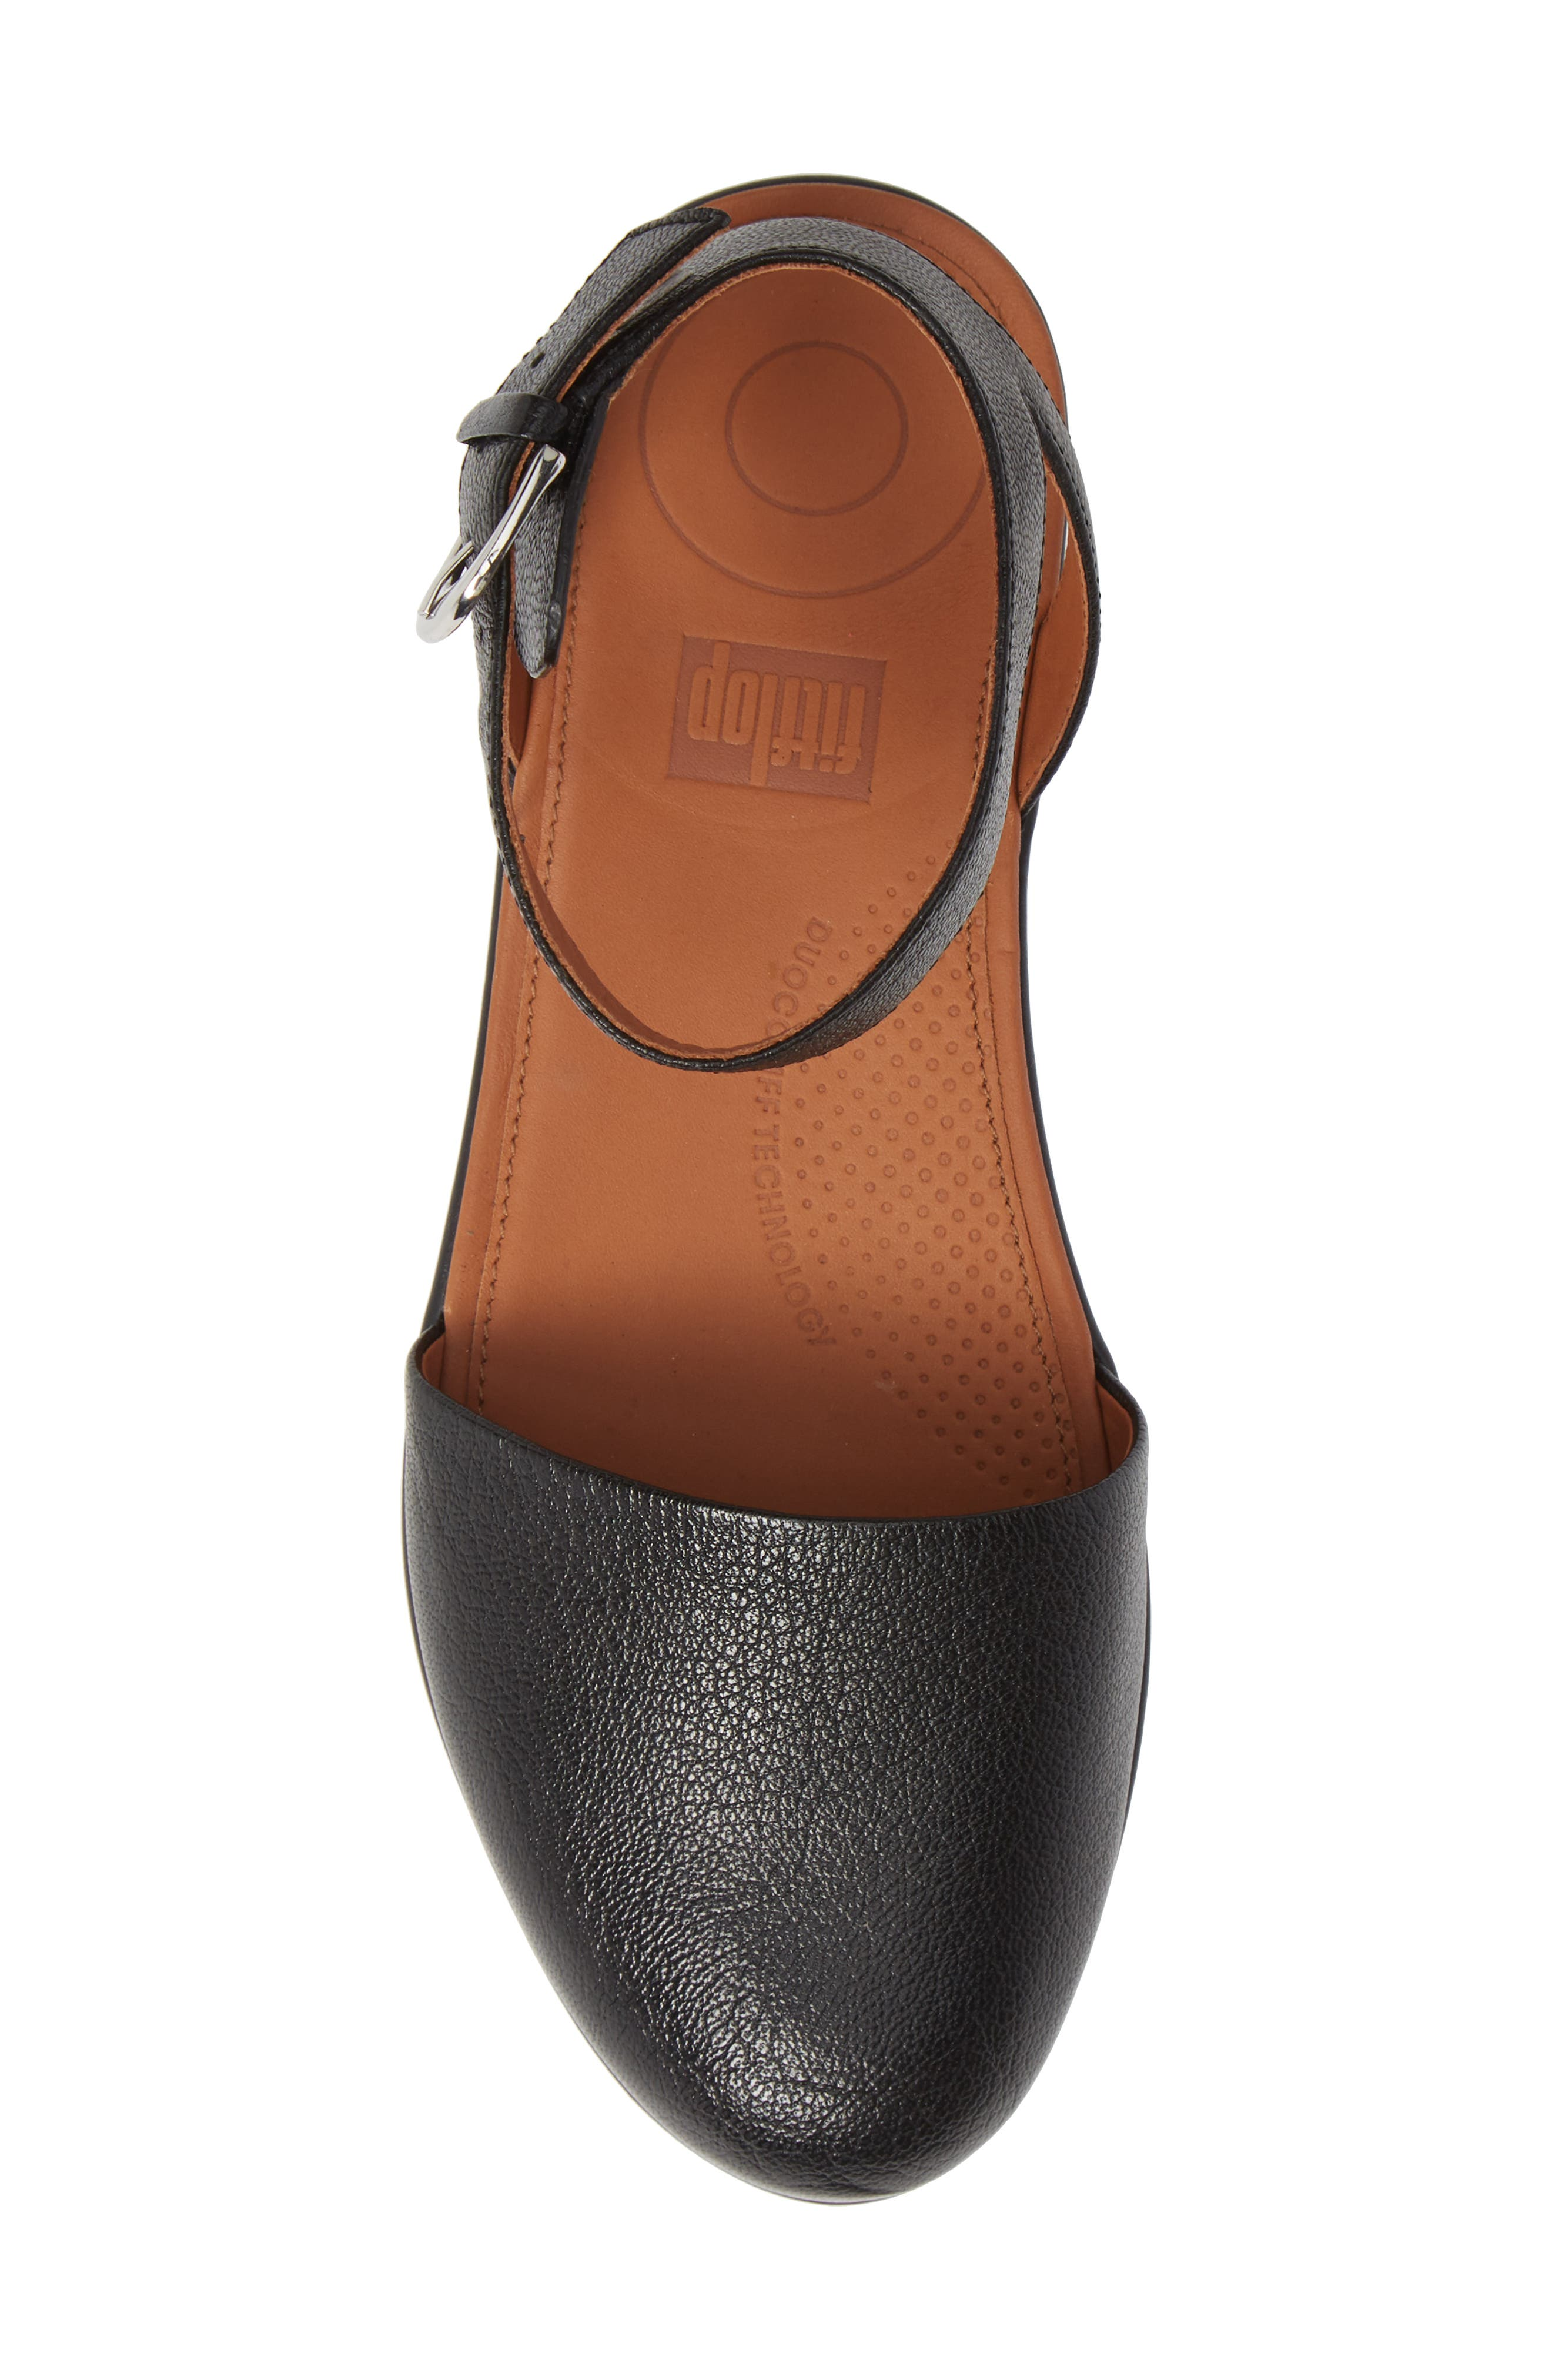 Cova Ankle Strap Sandal,                             Alternate thumbnail 5, color,                             BLACK LEATHER